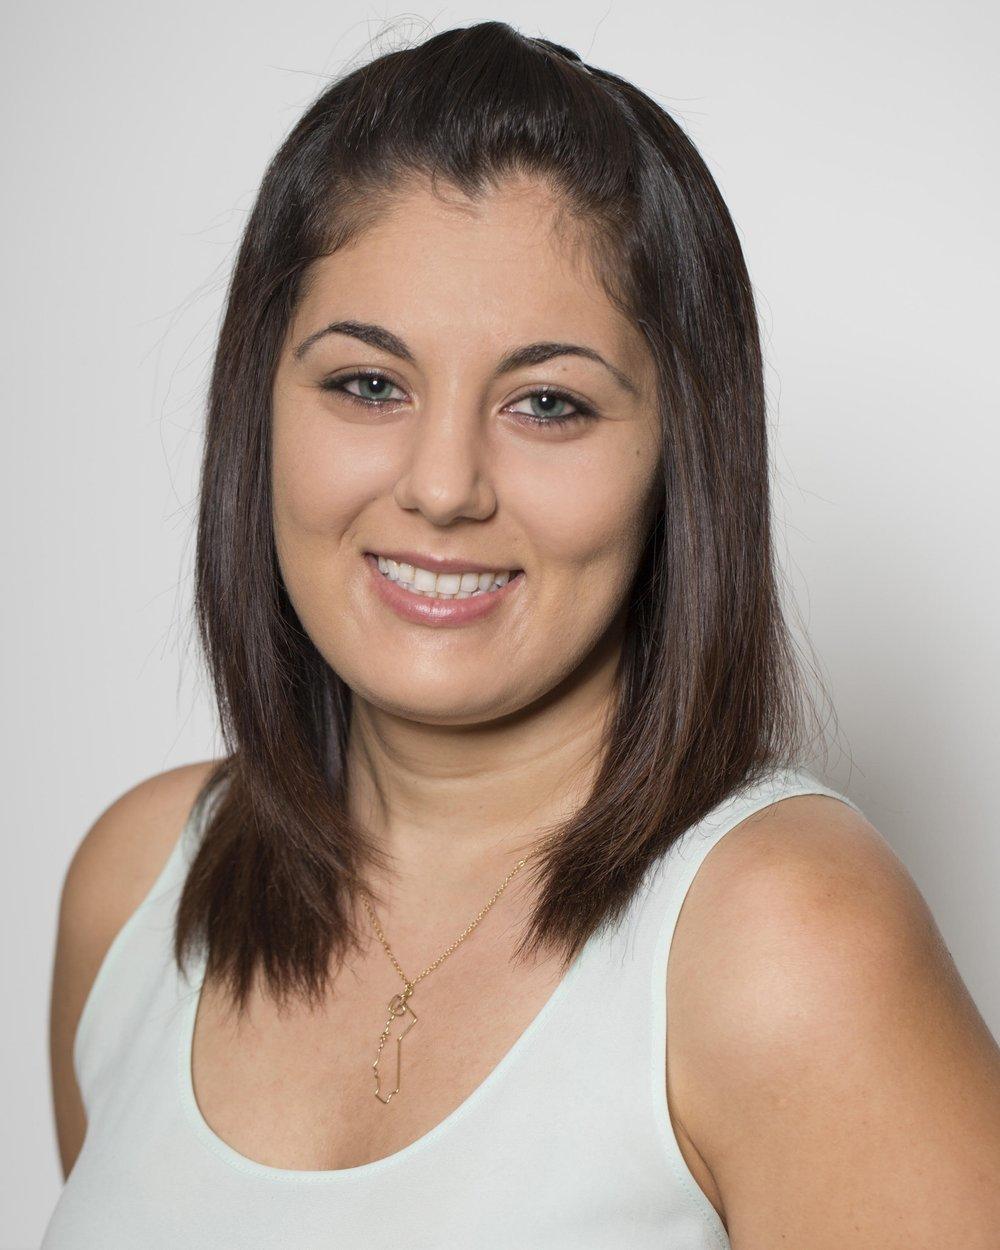 Sarah Arveson    PhD candidate in geology & geophysics   Resume workshop organizer